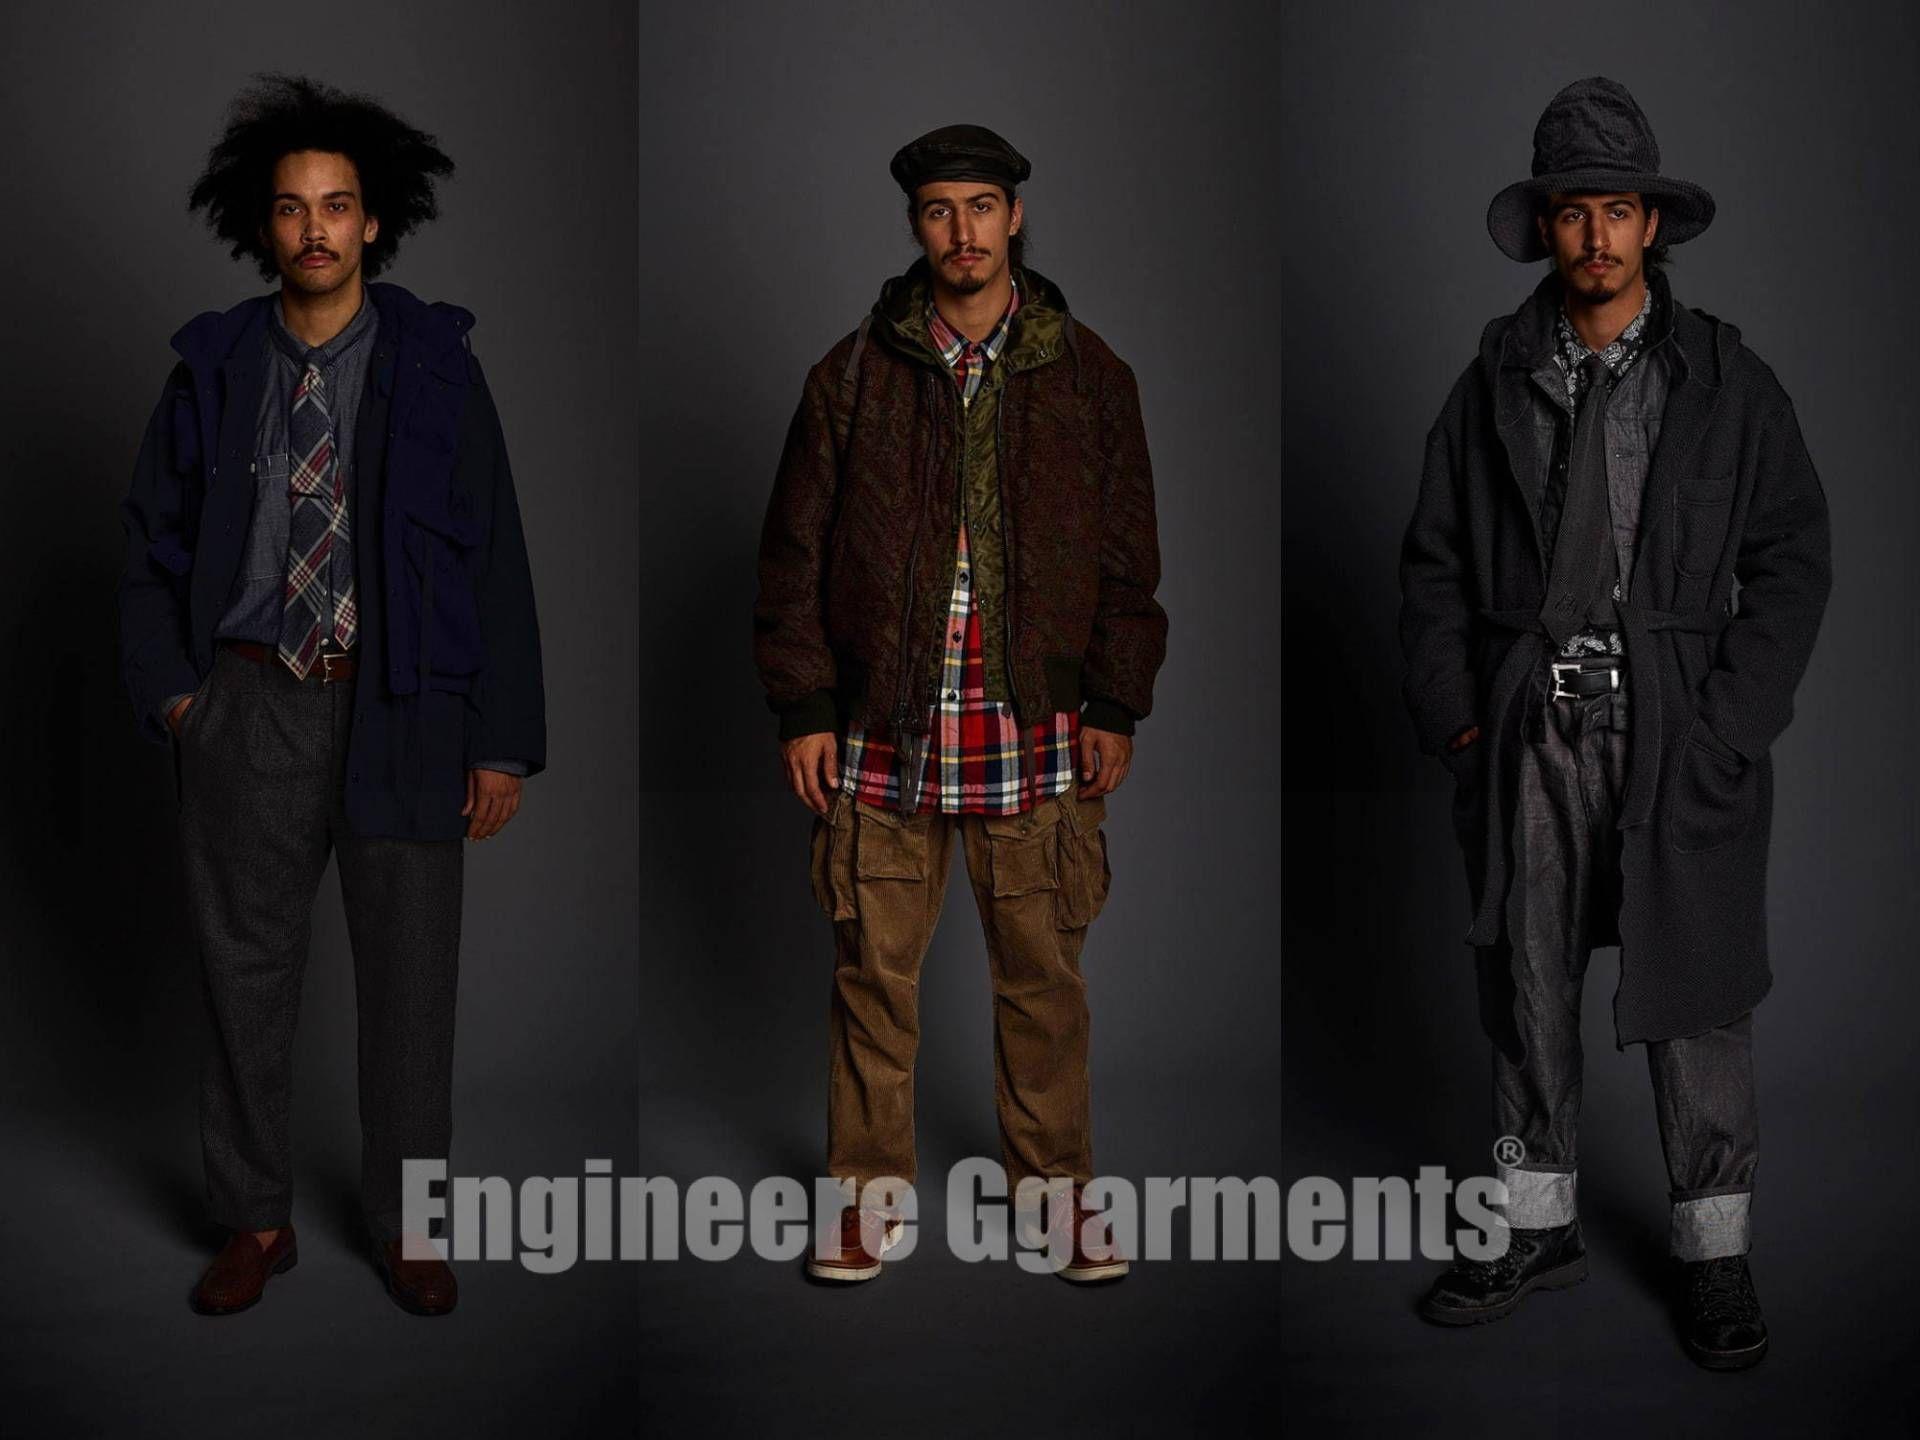 Engineered Garments(エンジニアードガーメンツ)